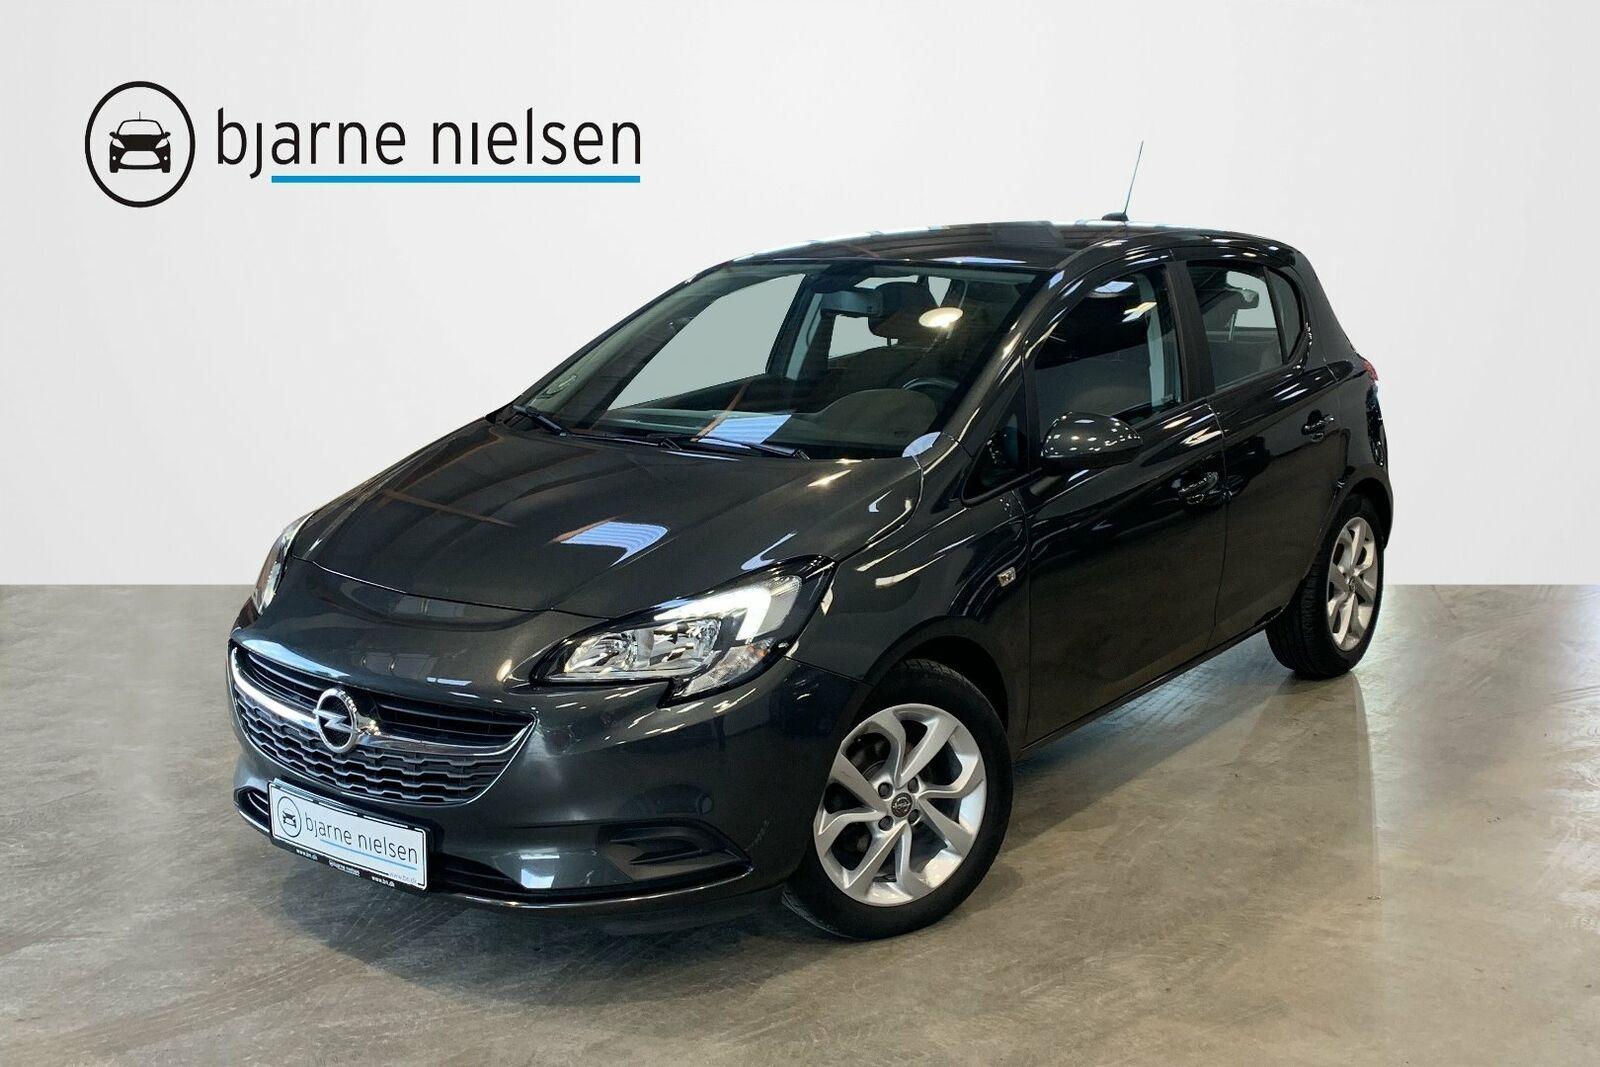 Opel Corsa Billede 7